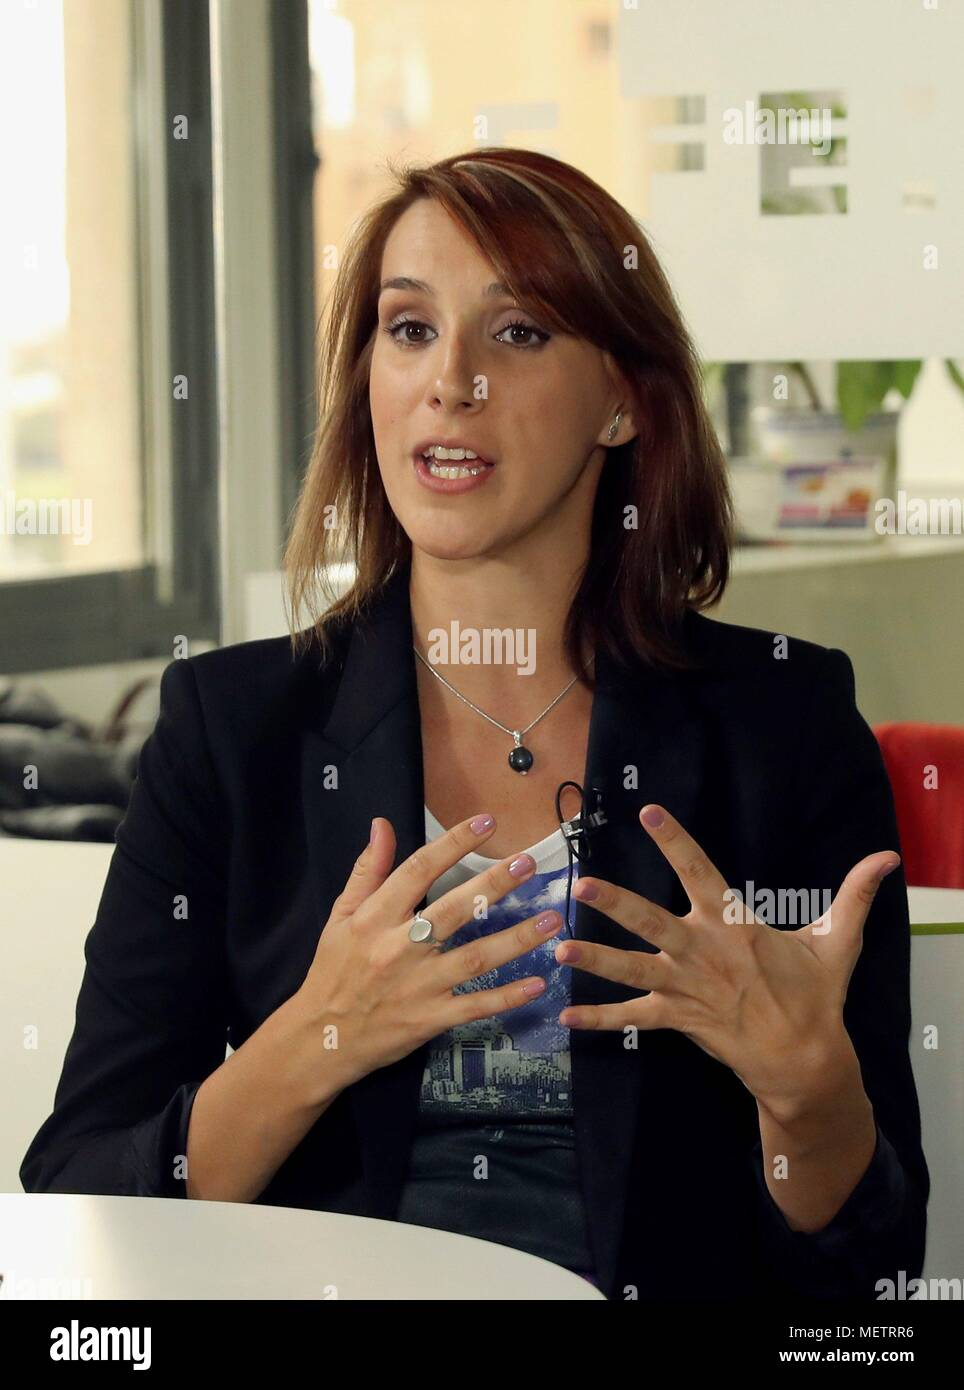 Madrid, Spain  23rd Apr, 2018  Spanish journalist Alicia Hernandez